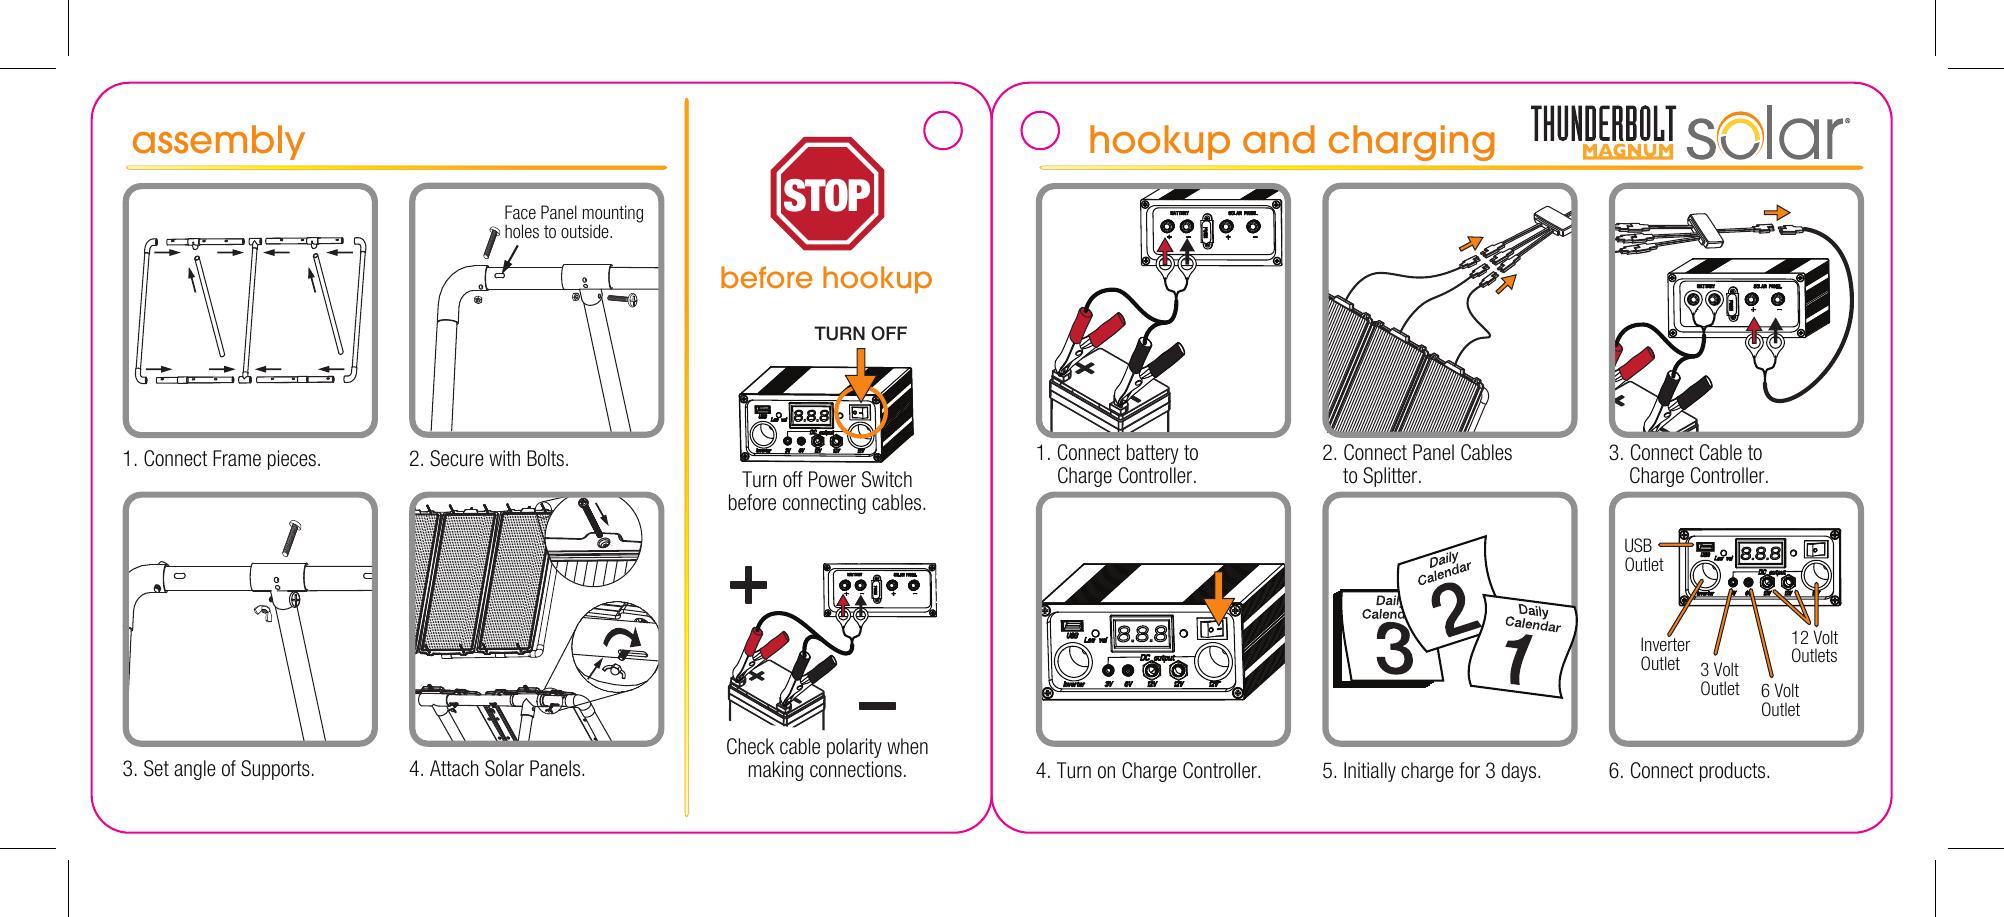 Harbor Freight Solar Panel Wiring Diagram Electrical Diagrams 12 Volt Kits 45 Watt Kit Quick Start Manual Parts